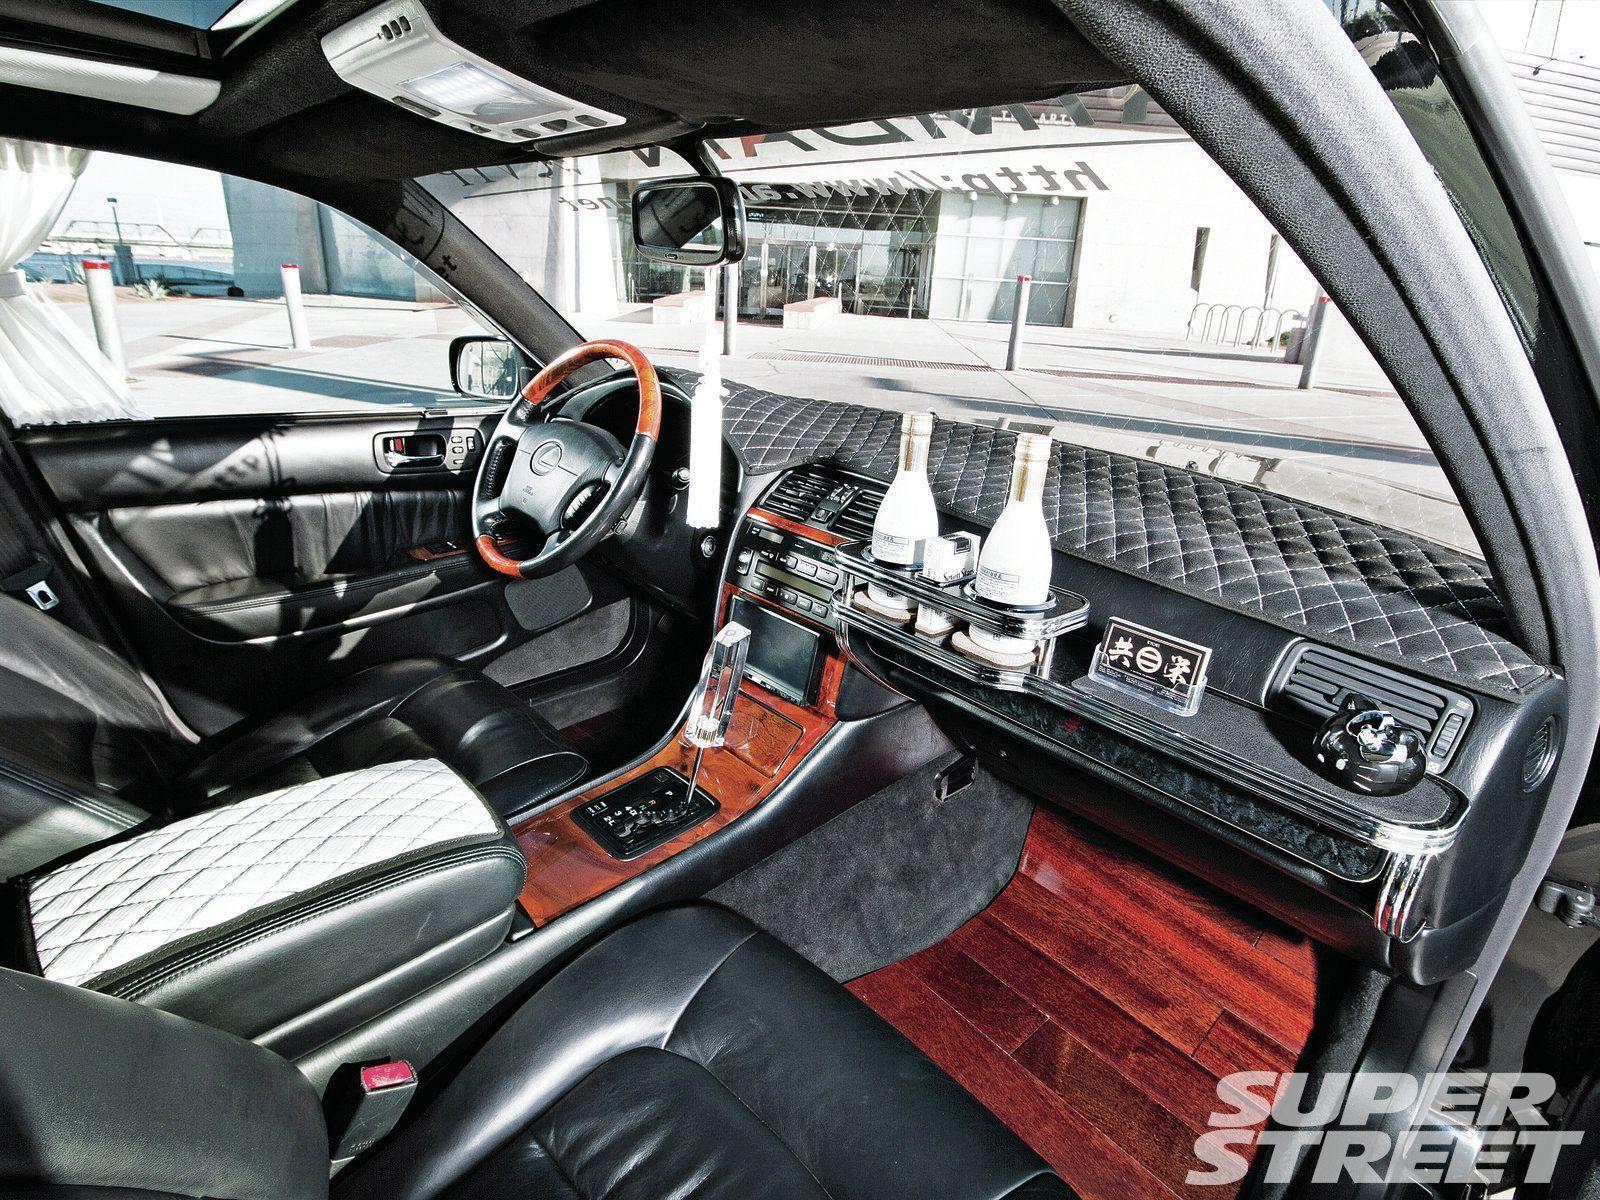 lexus ls400 vip interior - Google Search | vip car stuff ...